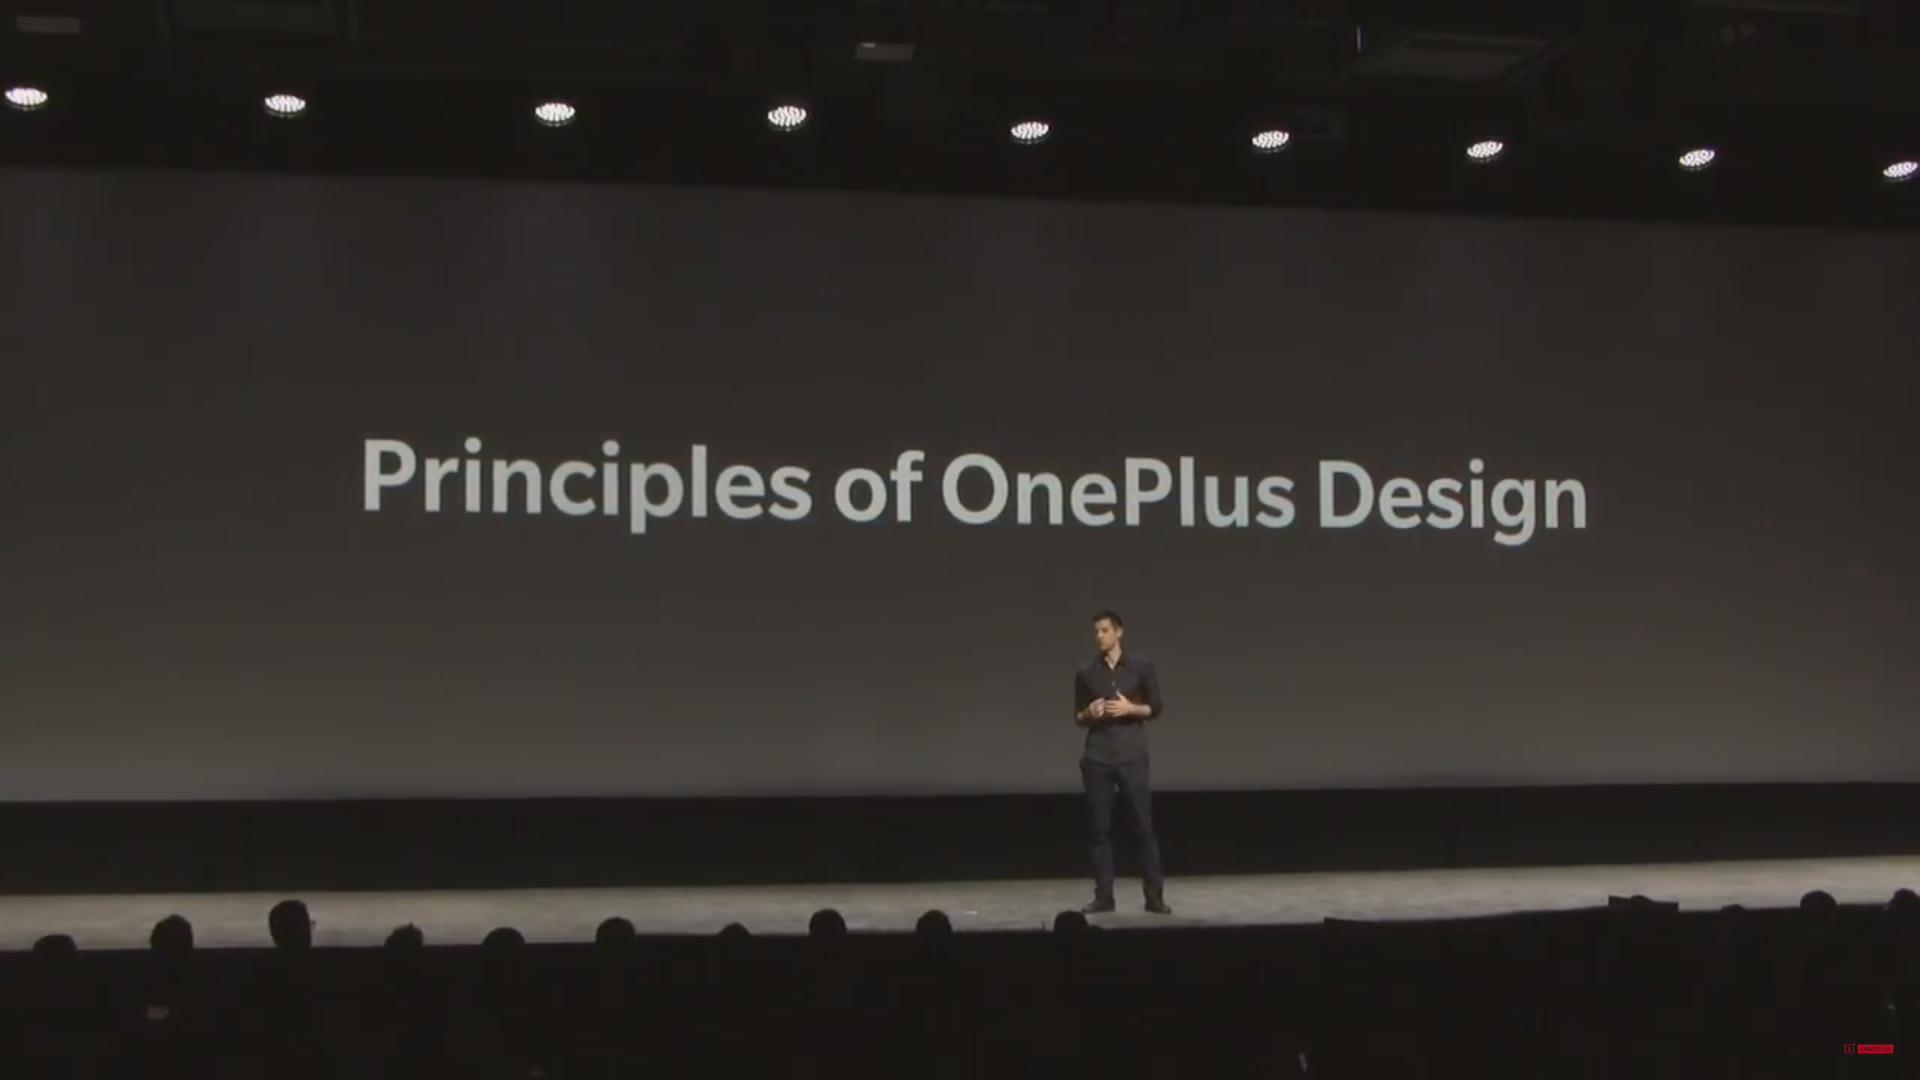 Oneplus تزيح الستار عن Oneplus 6T وبعض الاكسسوارات الجديدة 6